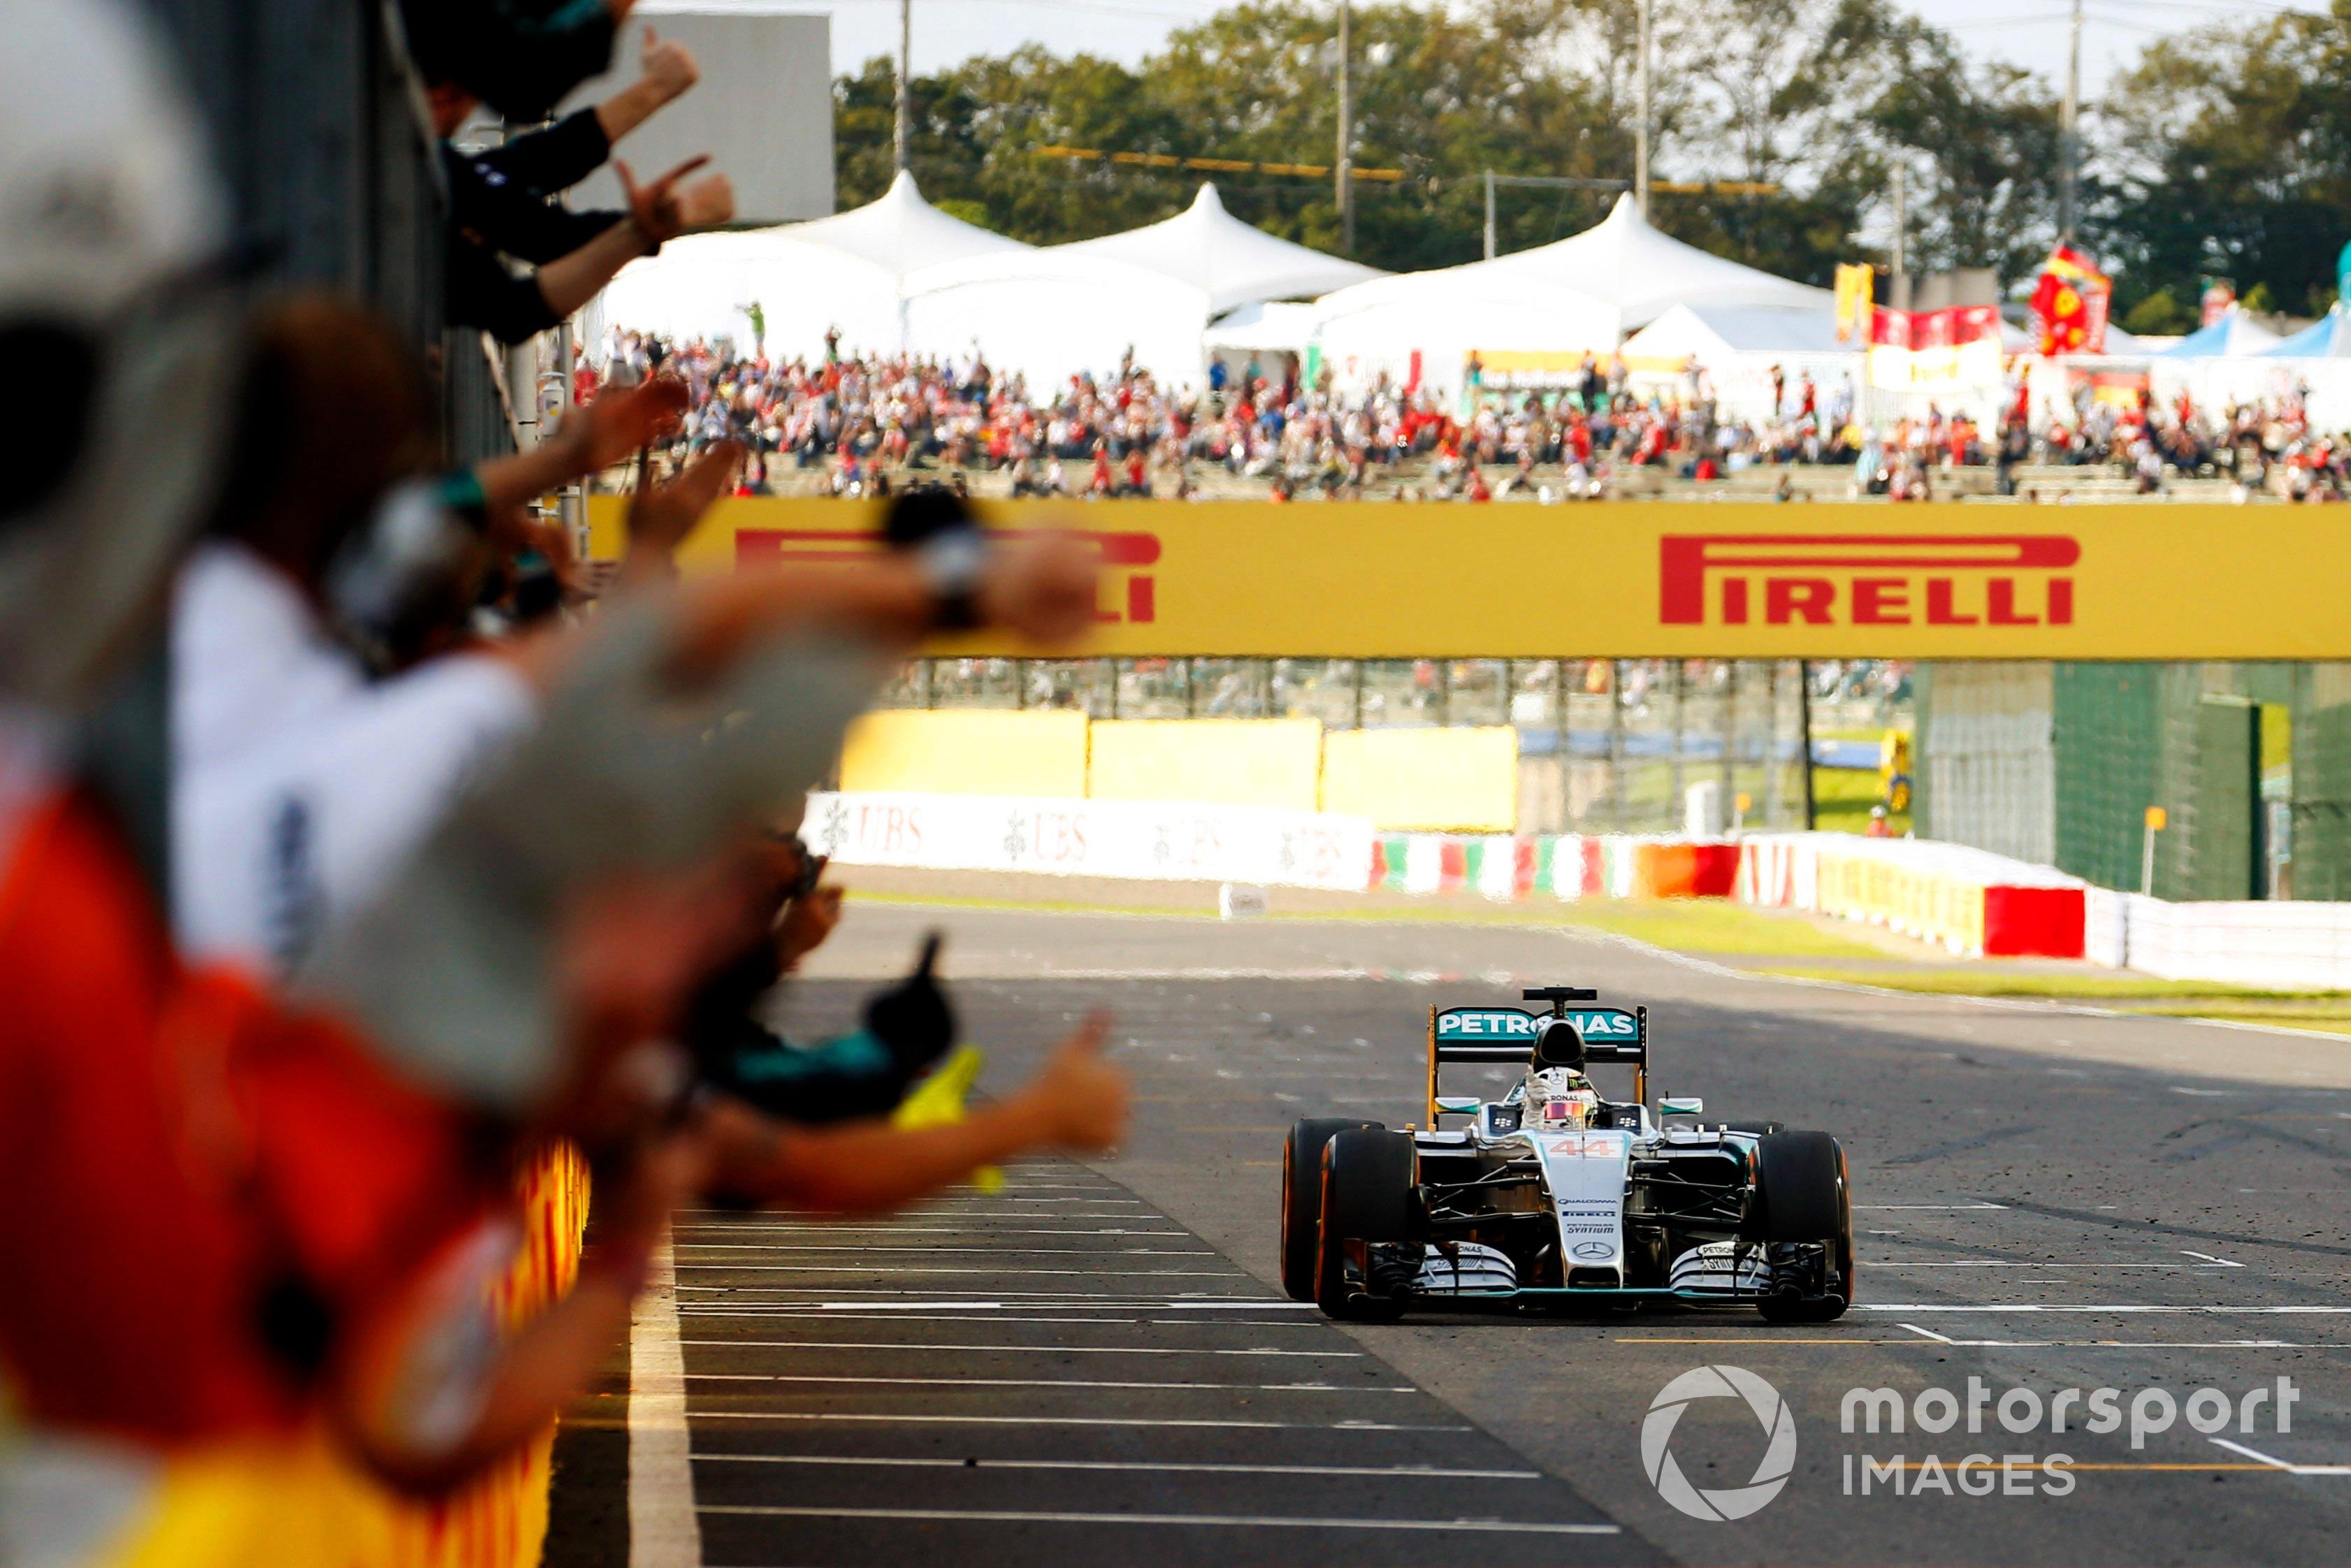 Lewis Hamilton, 2015 Japanese GP